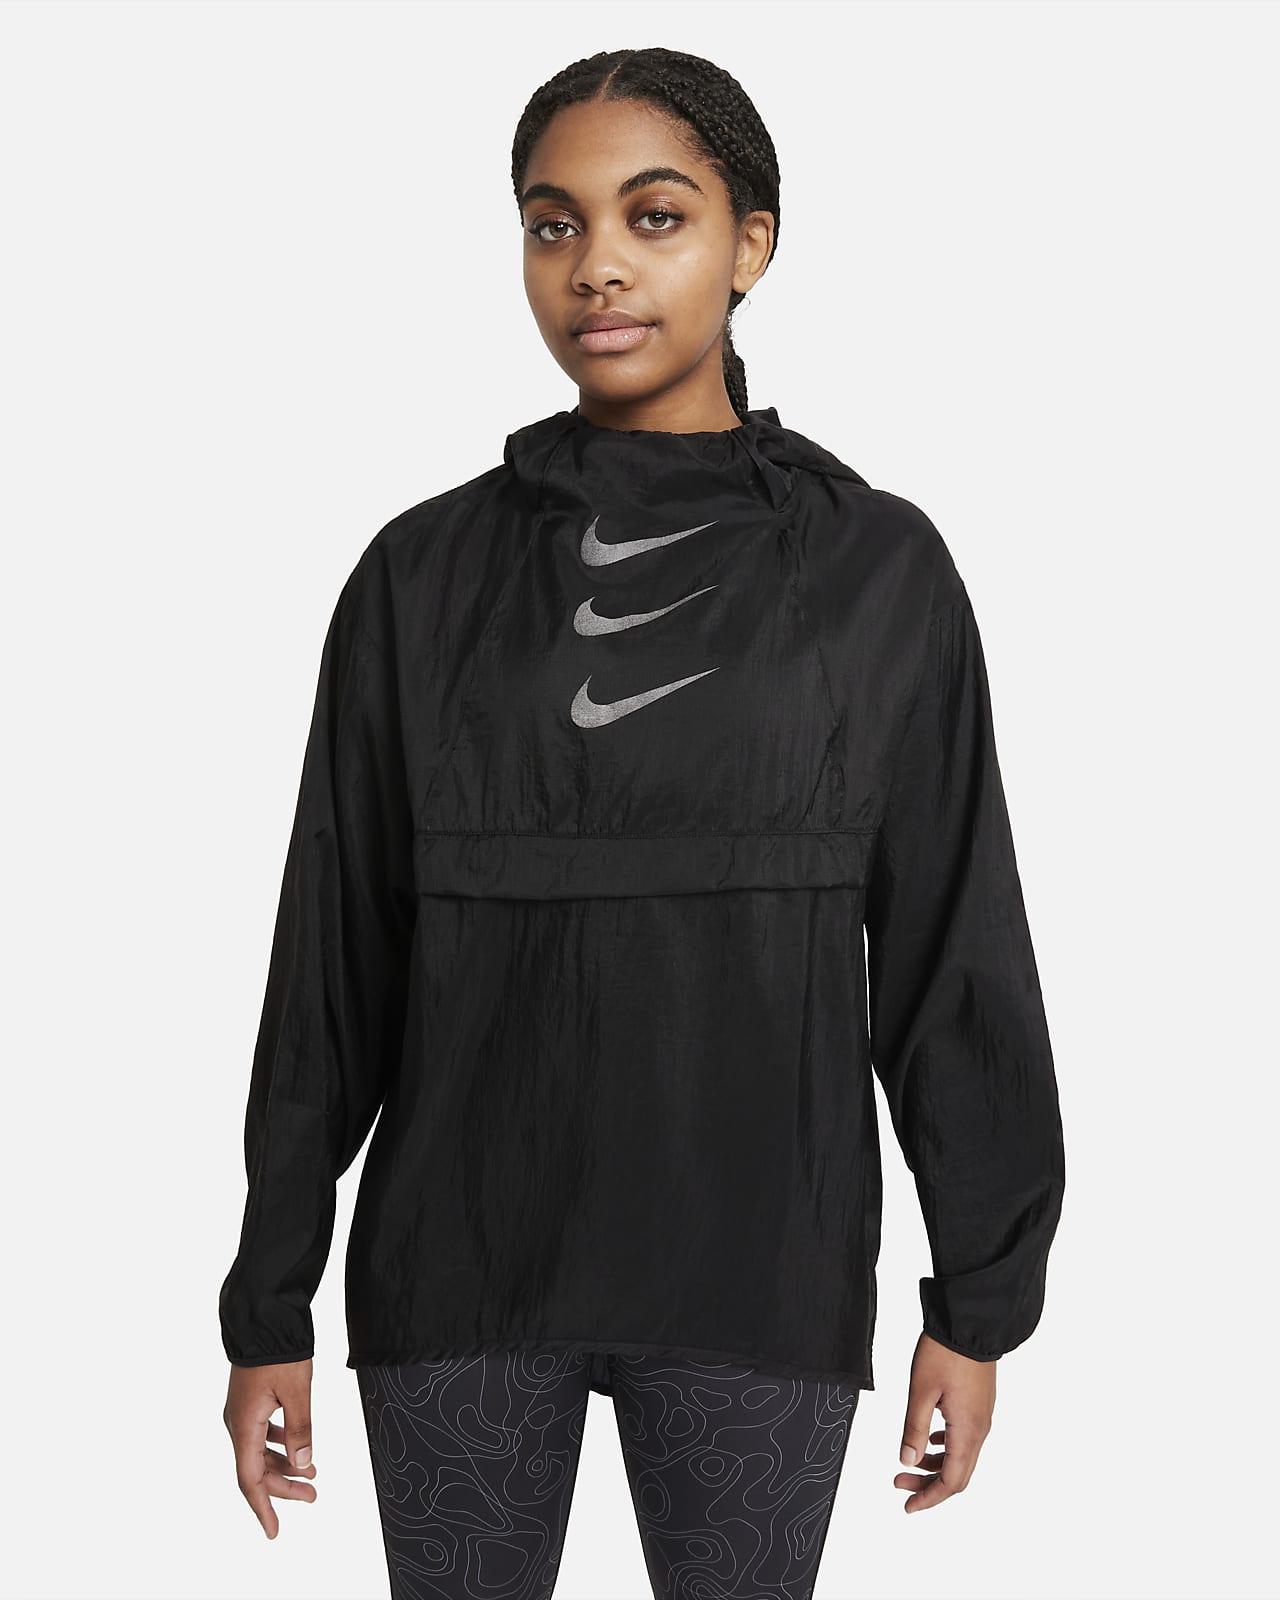 Sammenfoldelig Nike Run Division-løbejakke til kvinder